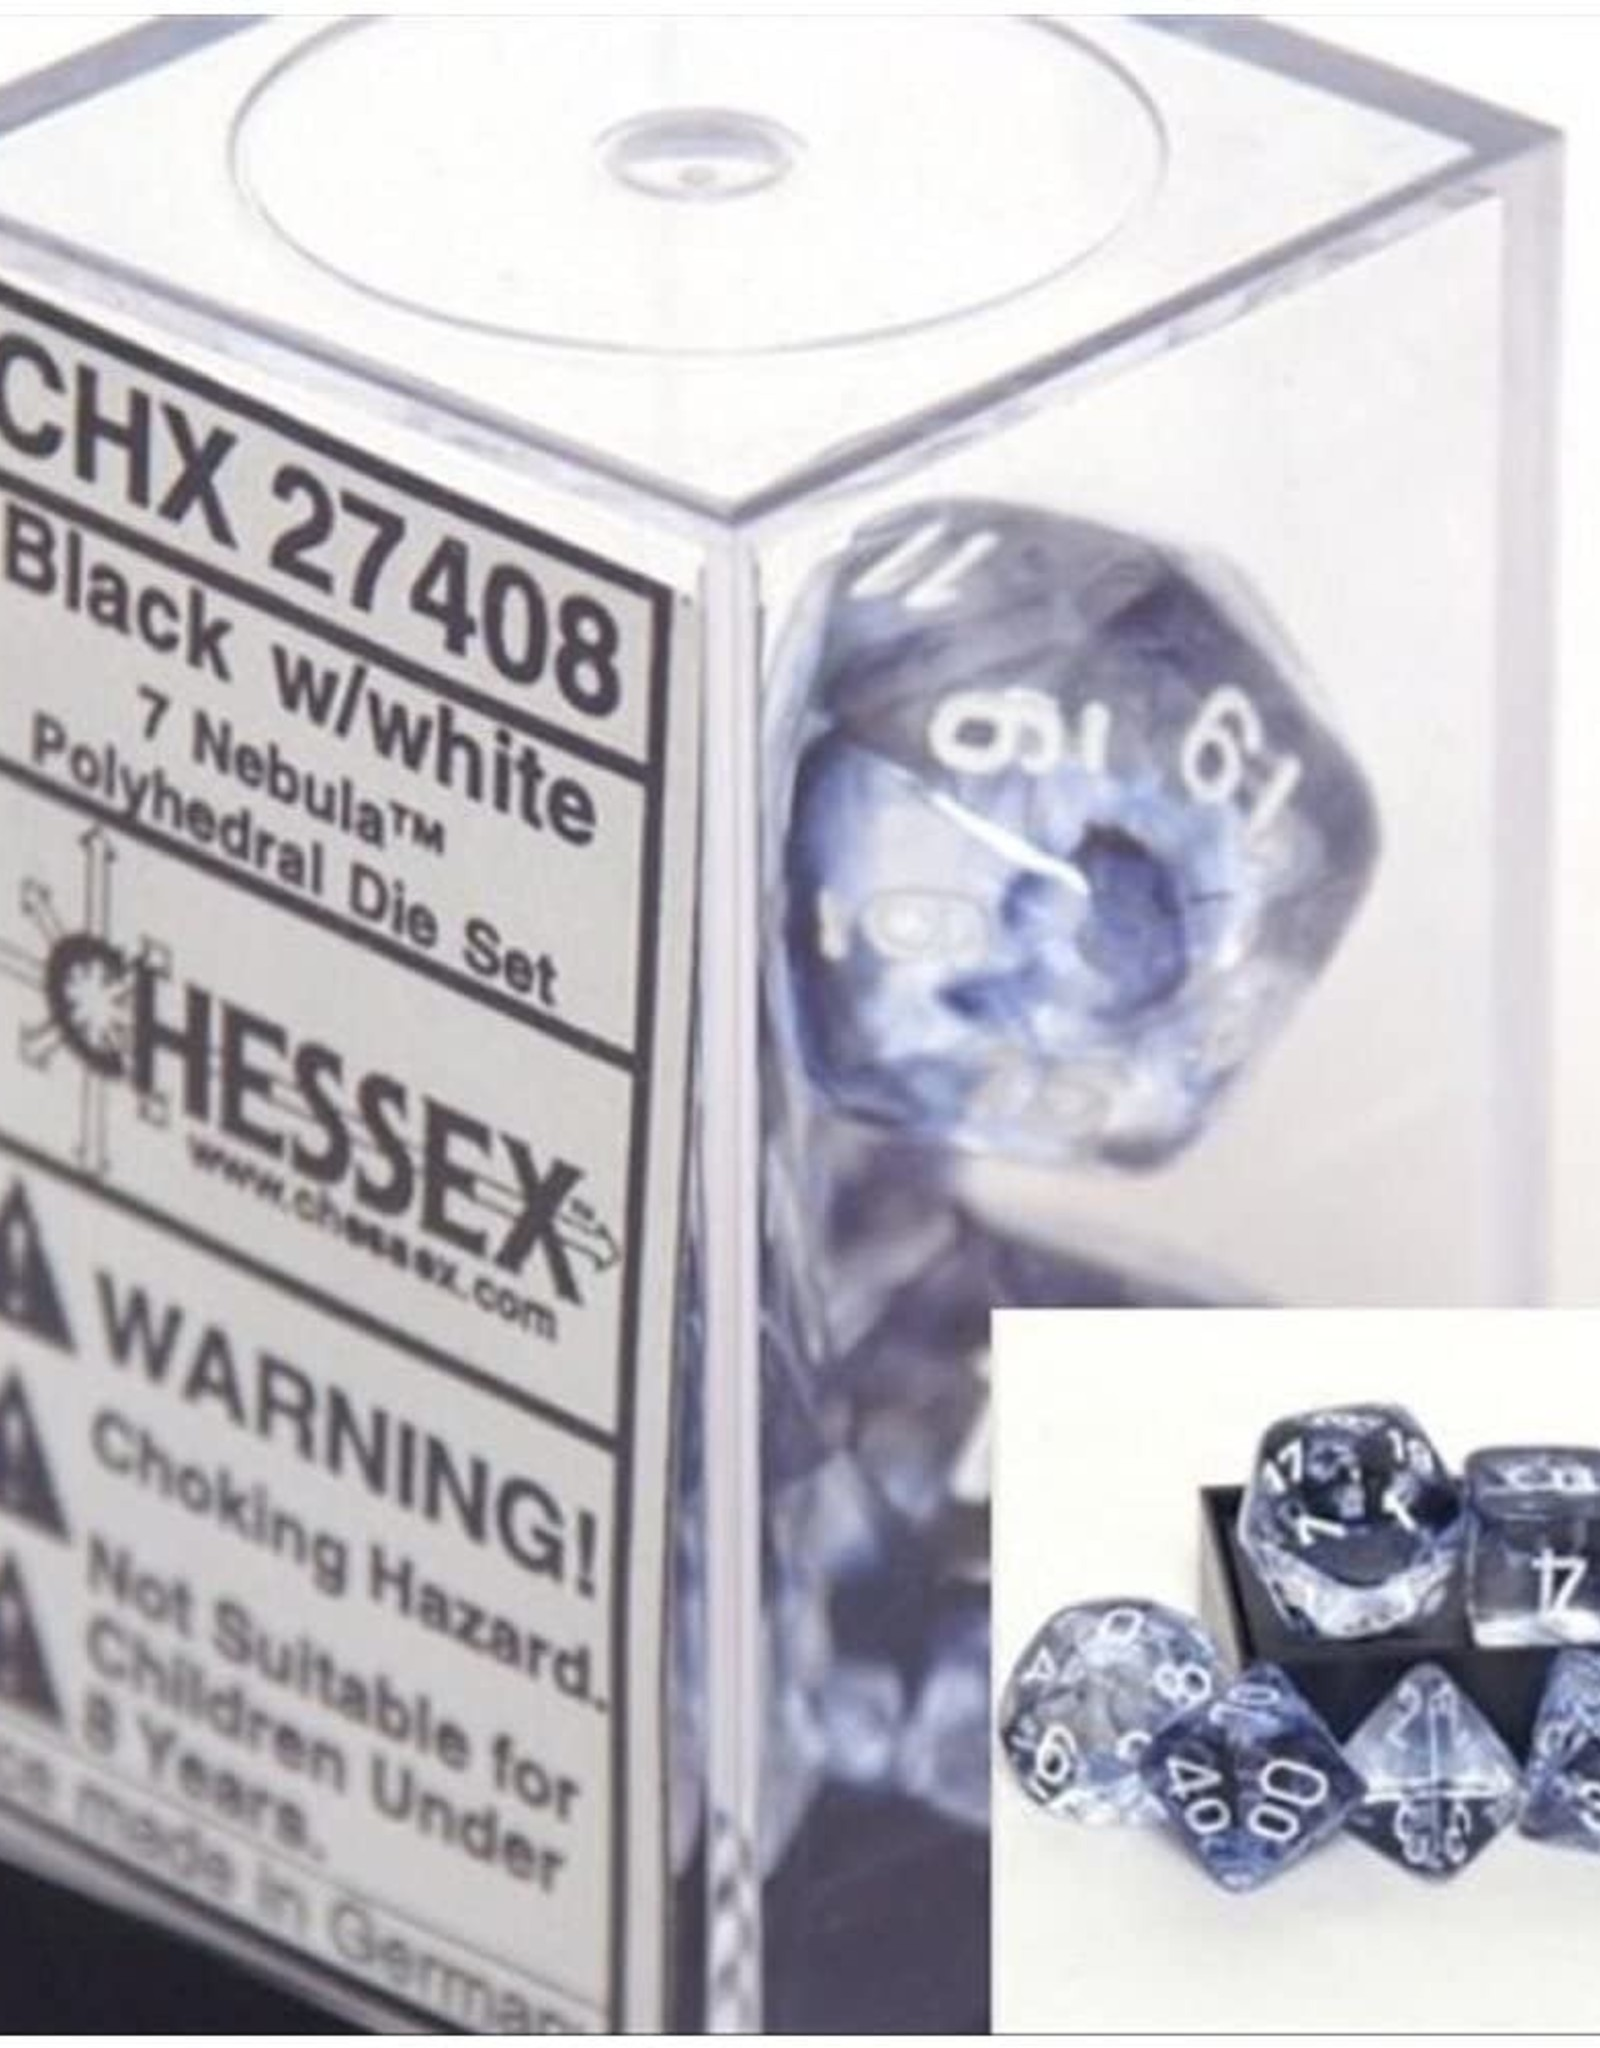 Chessex Nebula Black w/white polyhedral Set